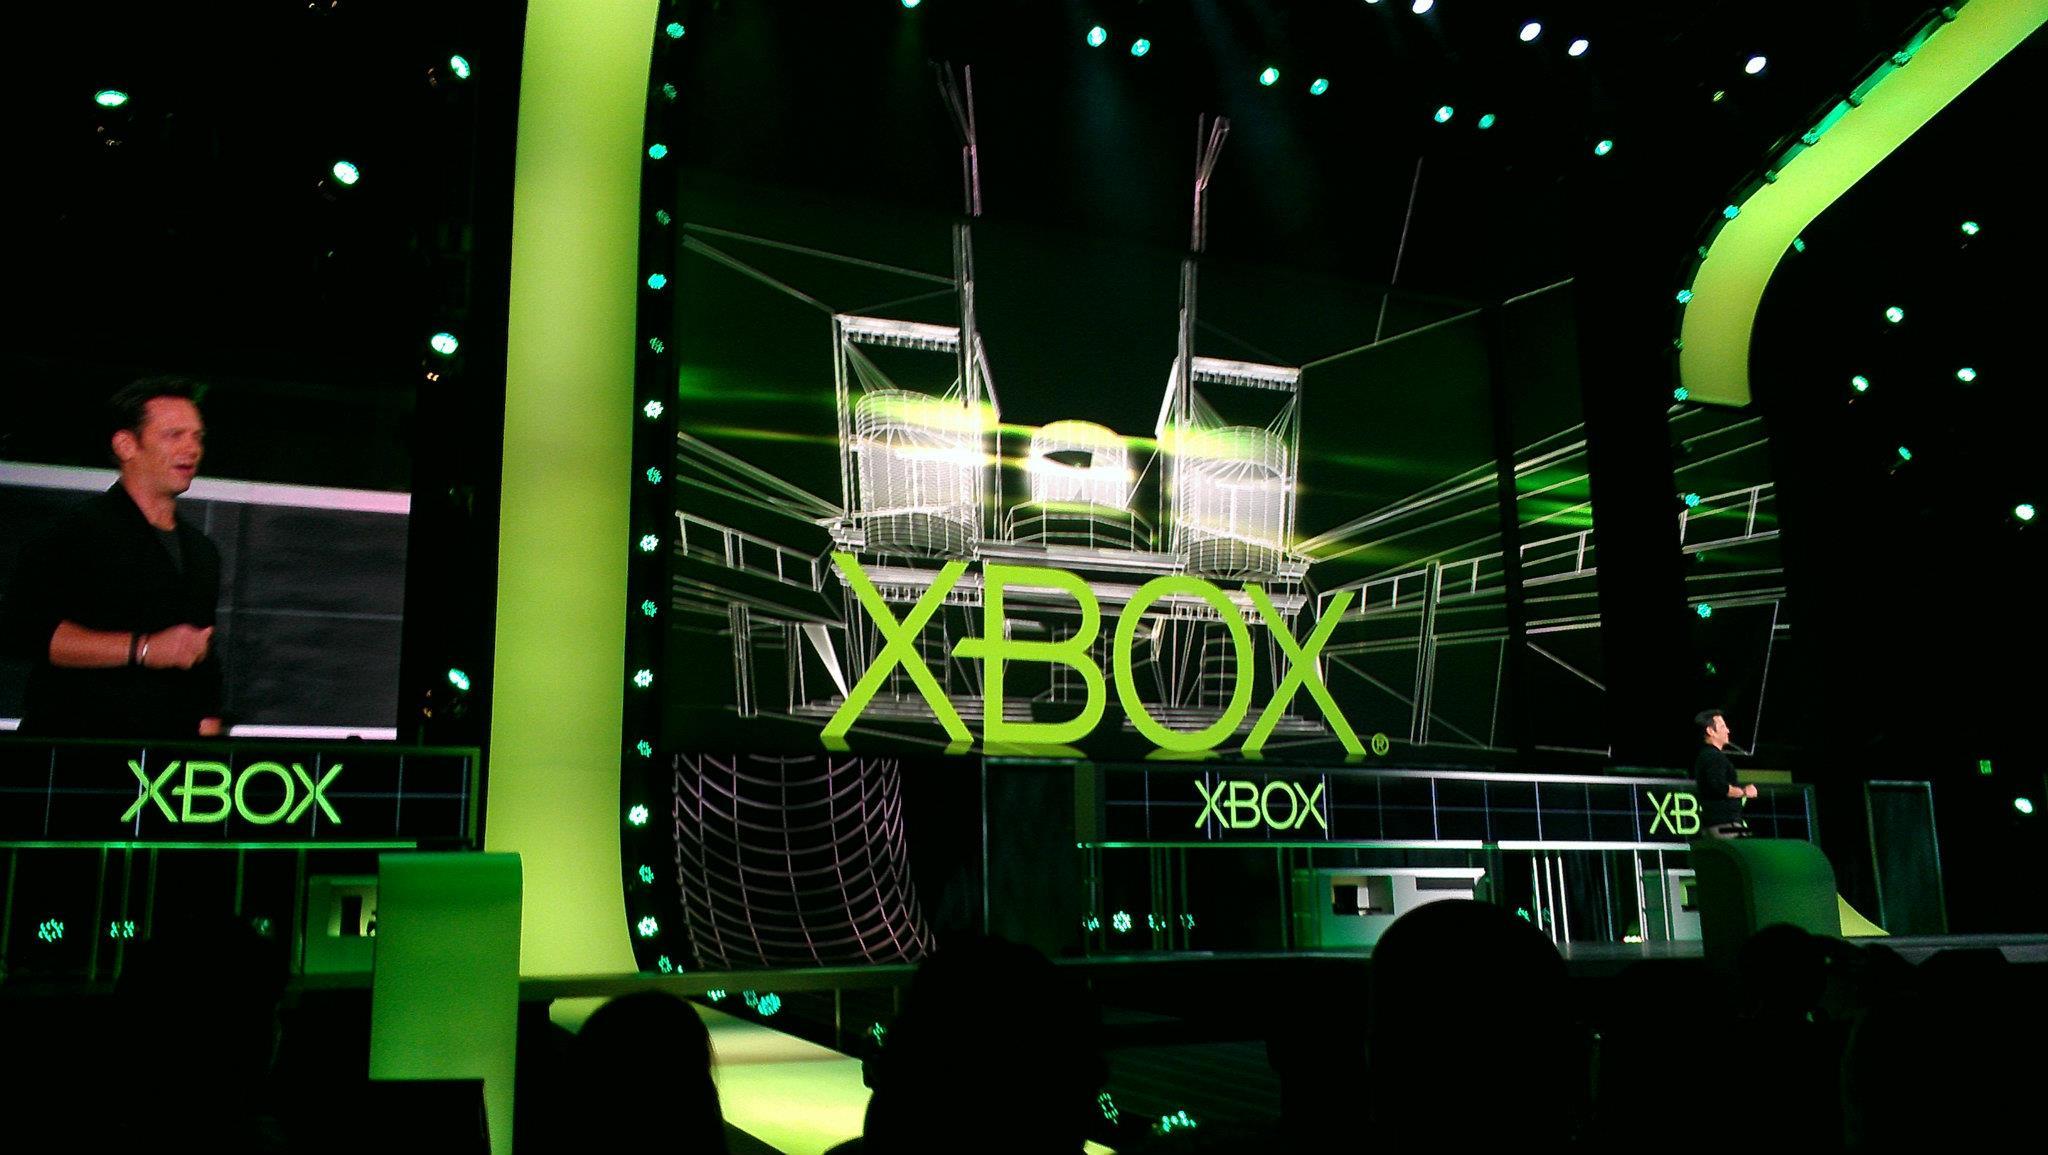 E3 Xbox 360